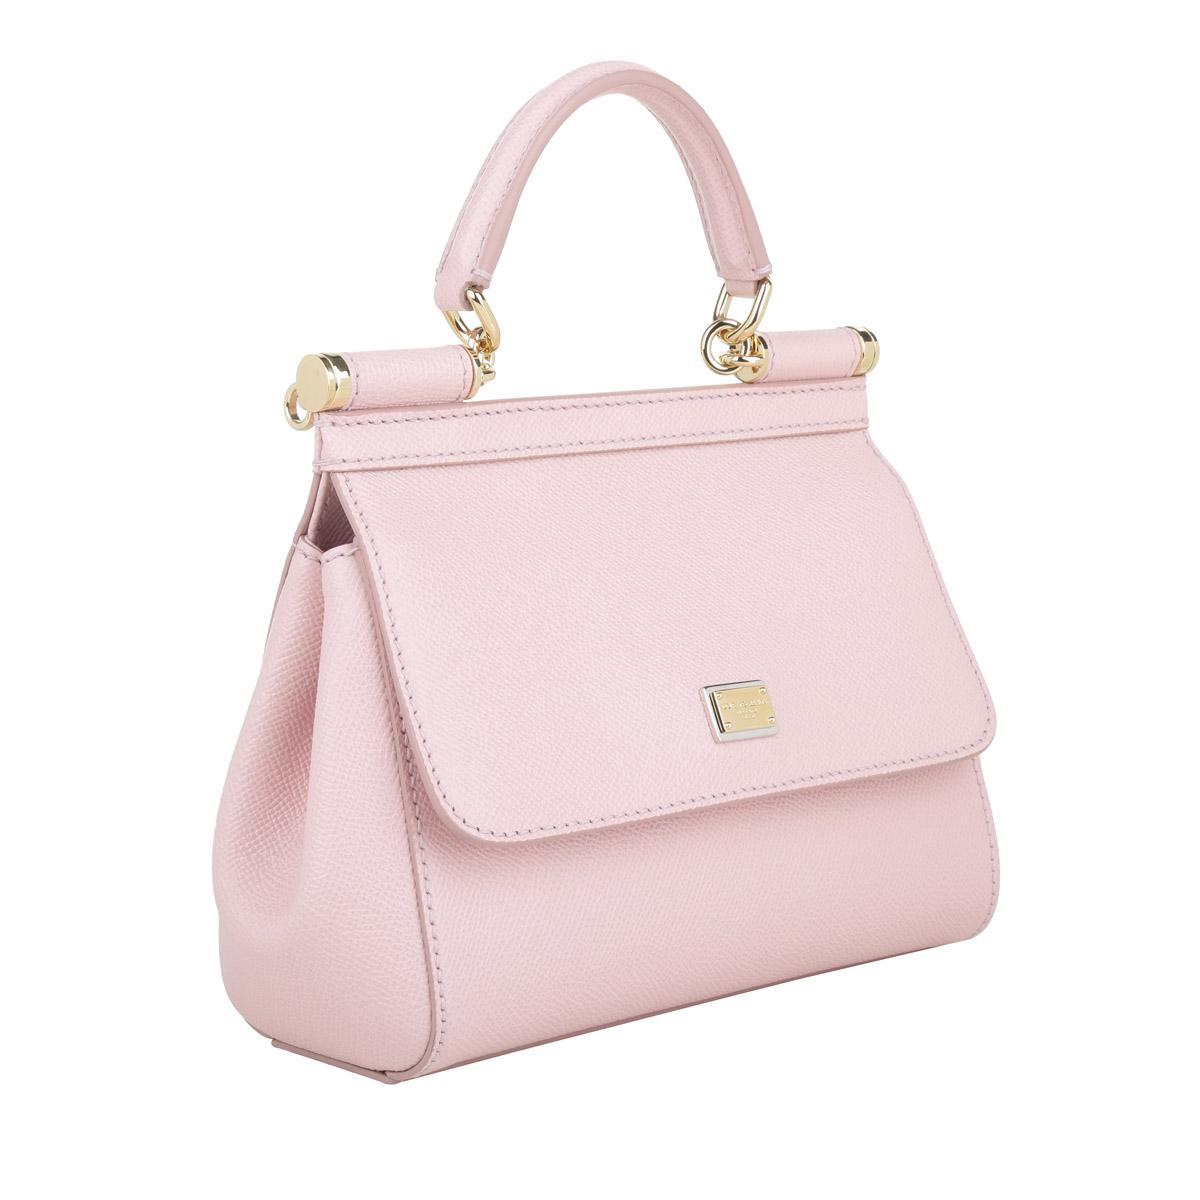 e4be0b541bf0 Dolce   Gabbana - Pink Mini Bag Sicily Vitello Stampa Dauphine Rosa Carne 2  - Lyst. View fullscreen